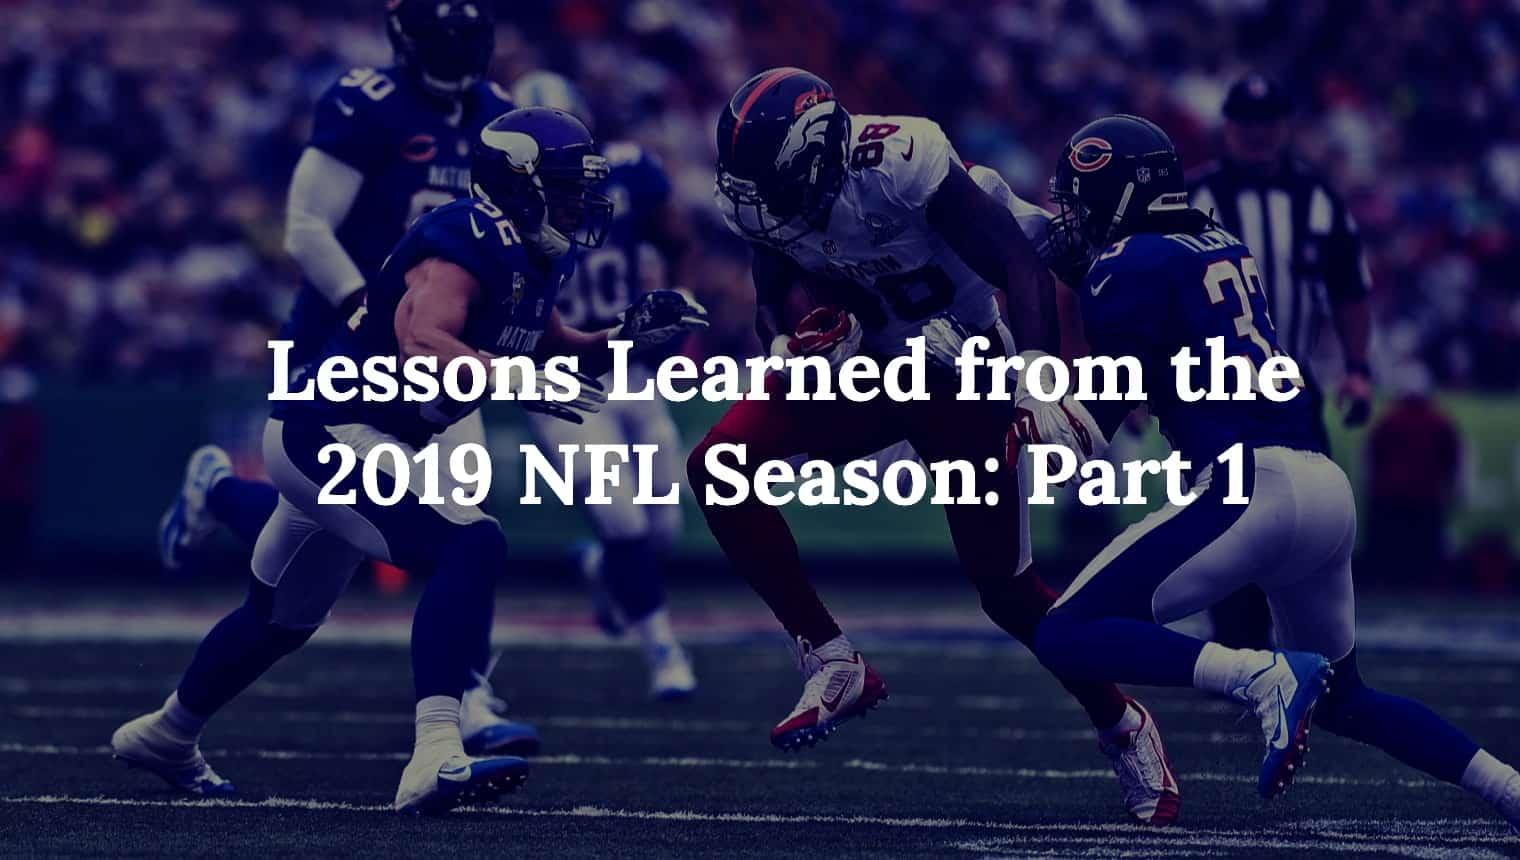 NFL super bowl lessons